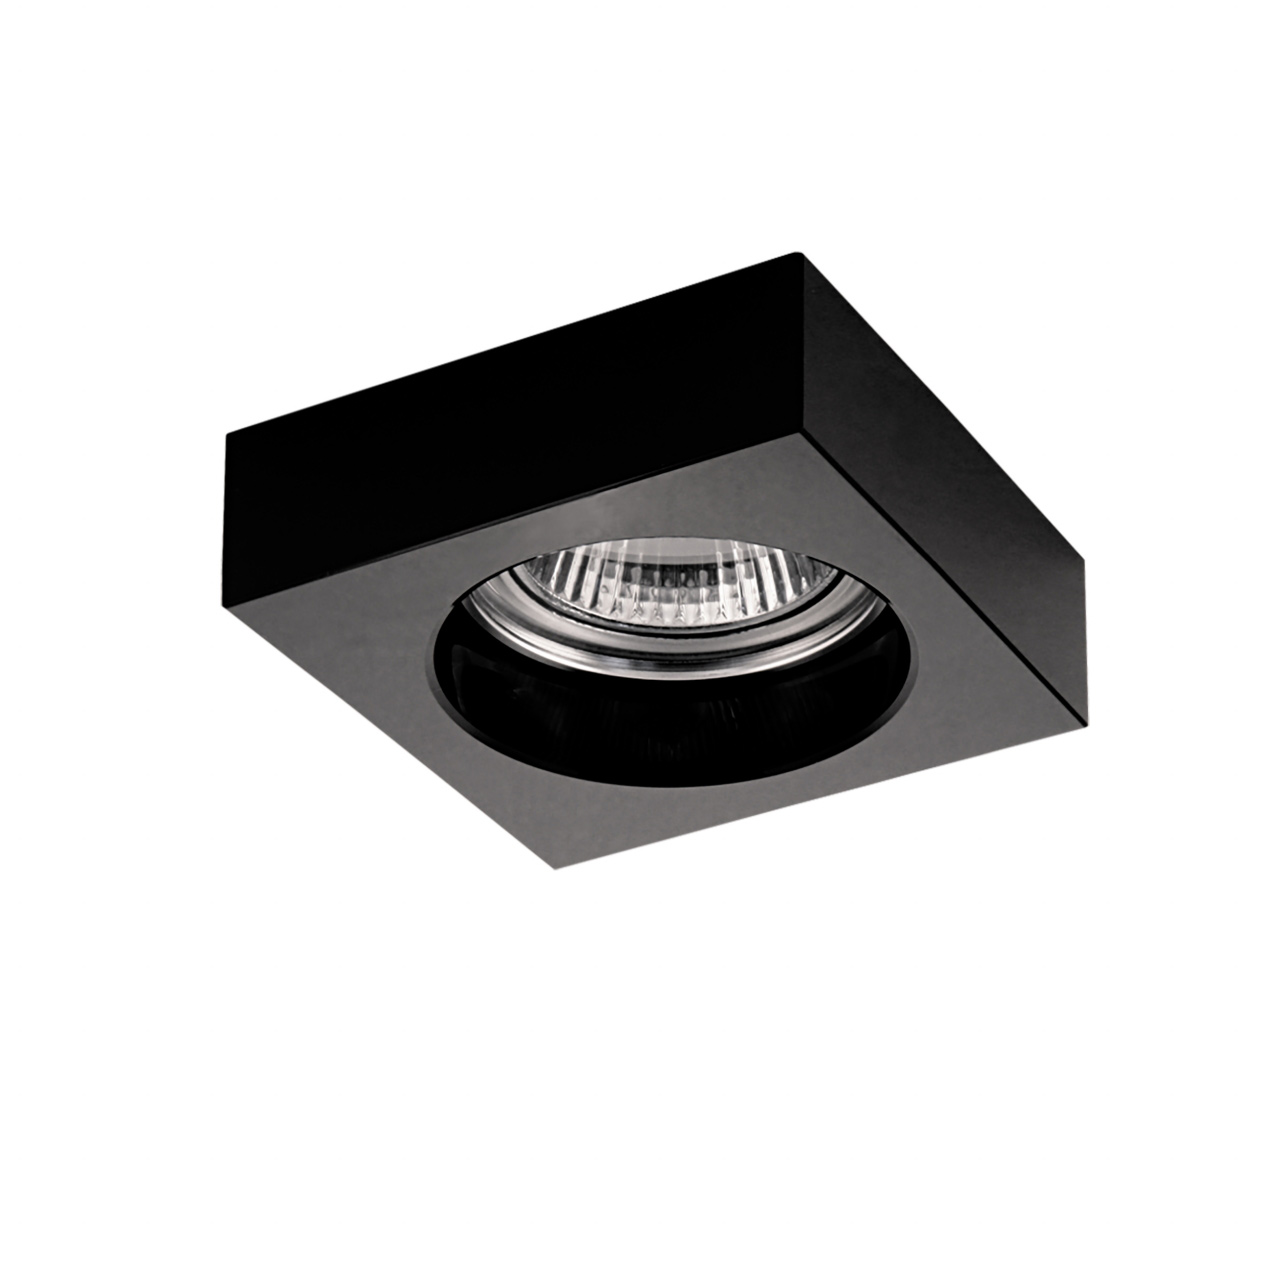 Светильник Lui Mini BL MR16 / HP16 хром / черный Lightstar 006147